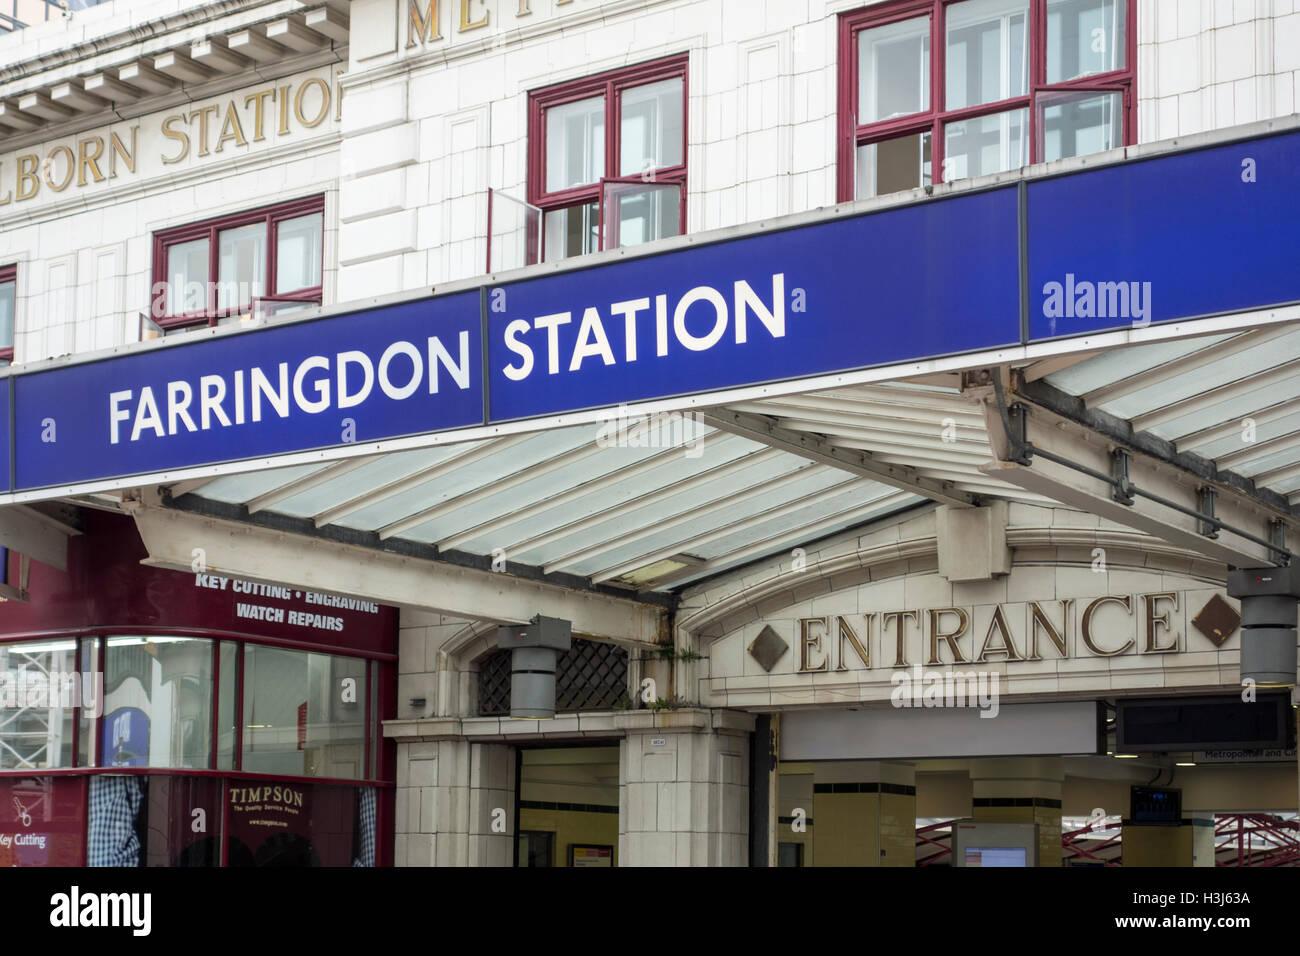 Farringdon Station entrance exterior sign, London, UK - Stock Image